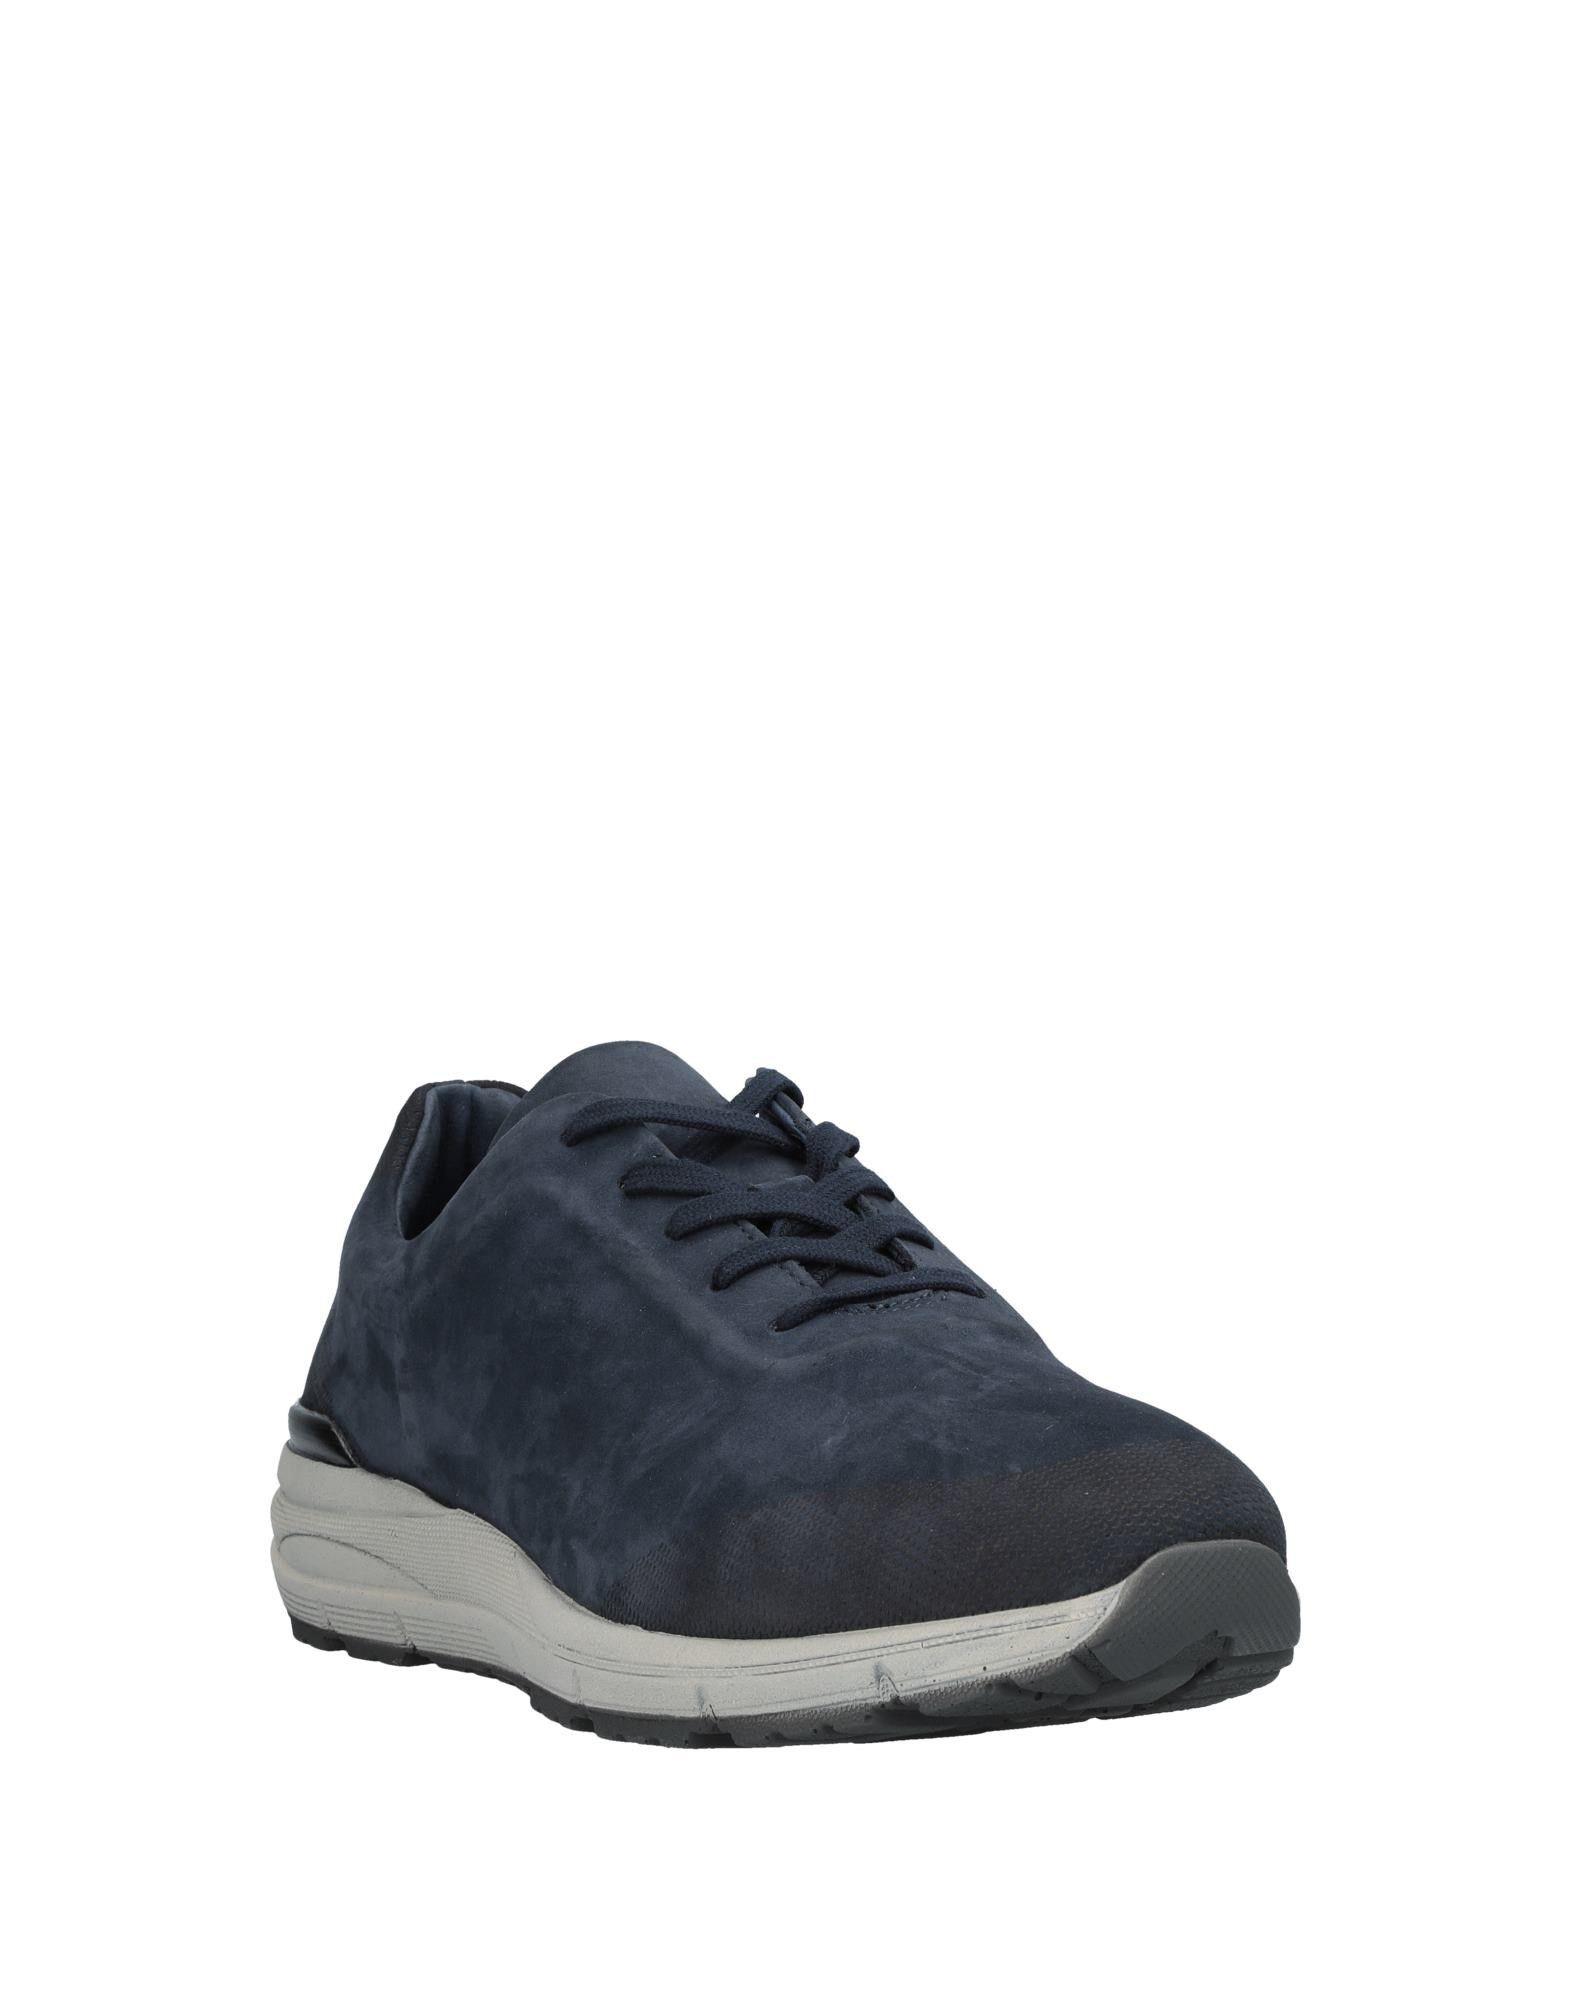 Moda 11530496EQ Sneakers Cafènoir Uomo - 11530496EQ Moda 303bad